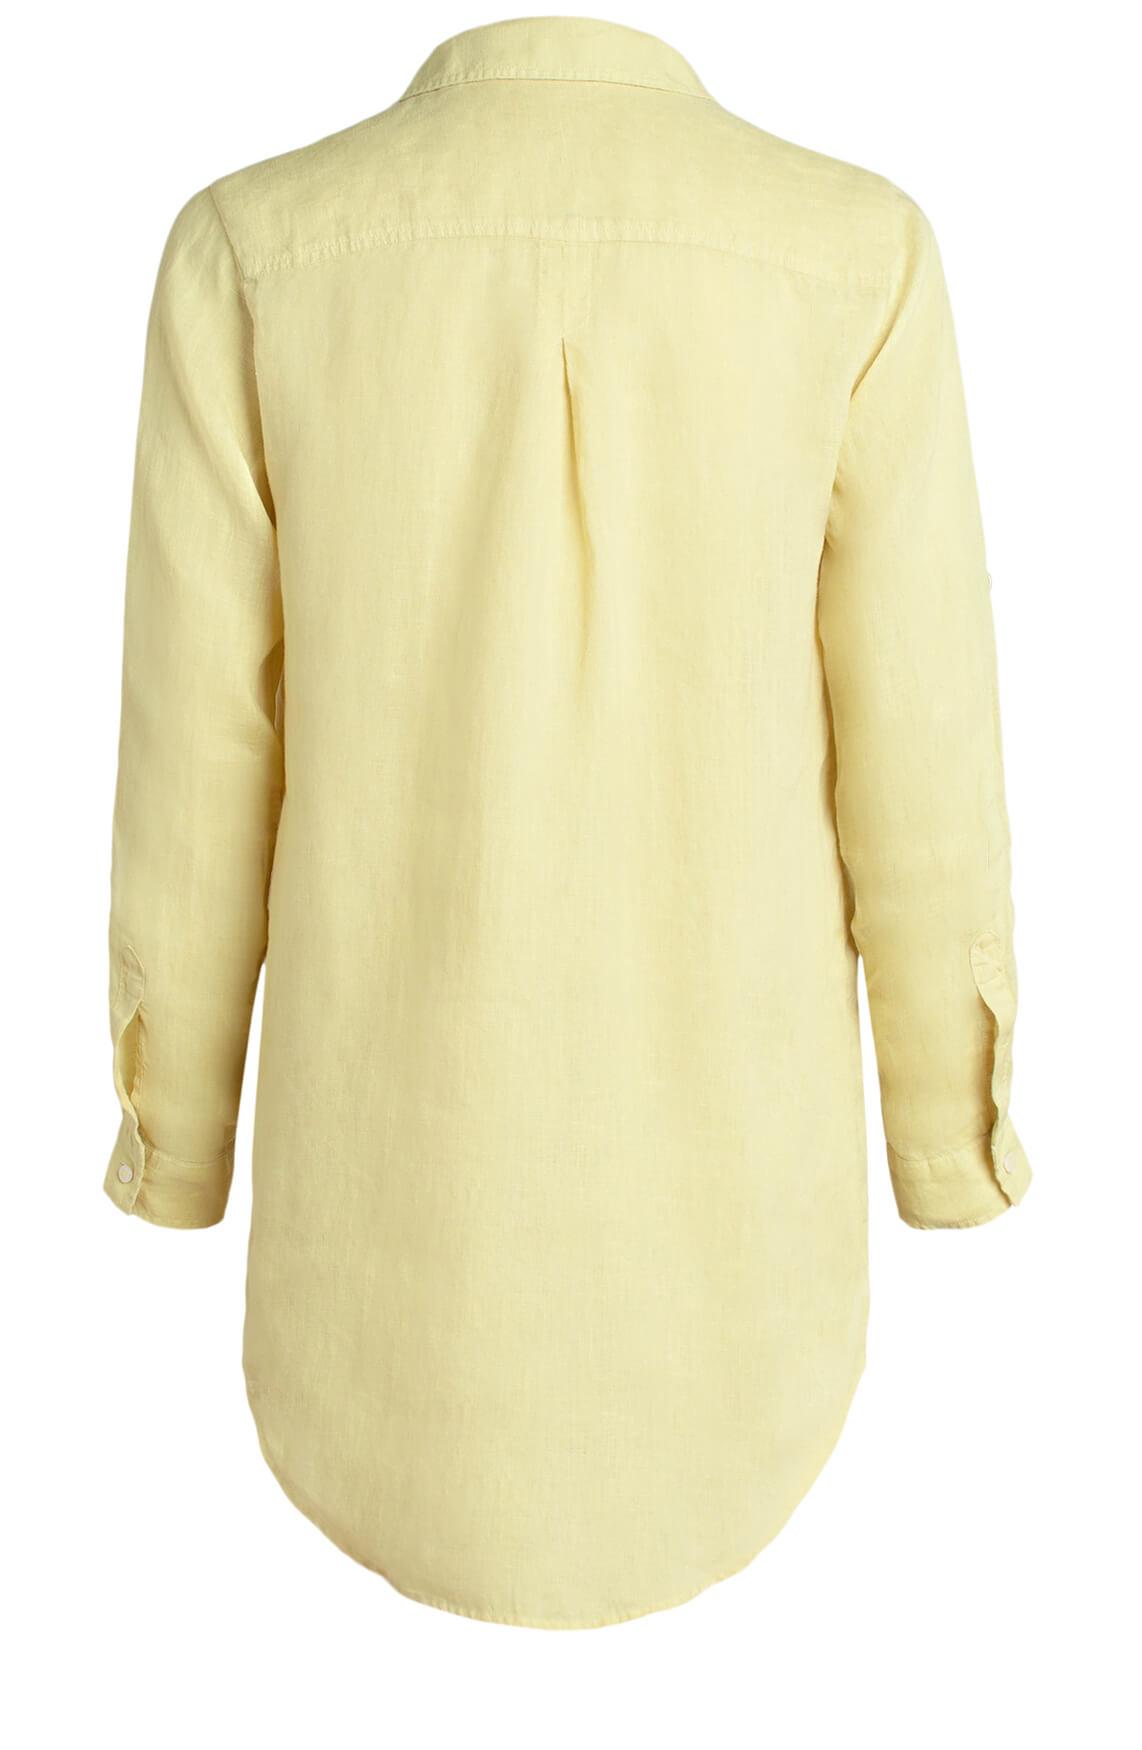 Moscow Dames Linnen blouse geel